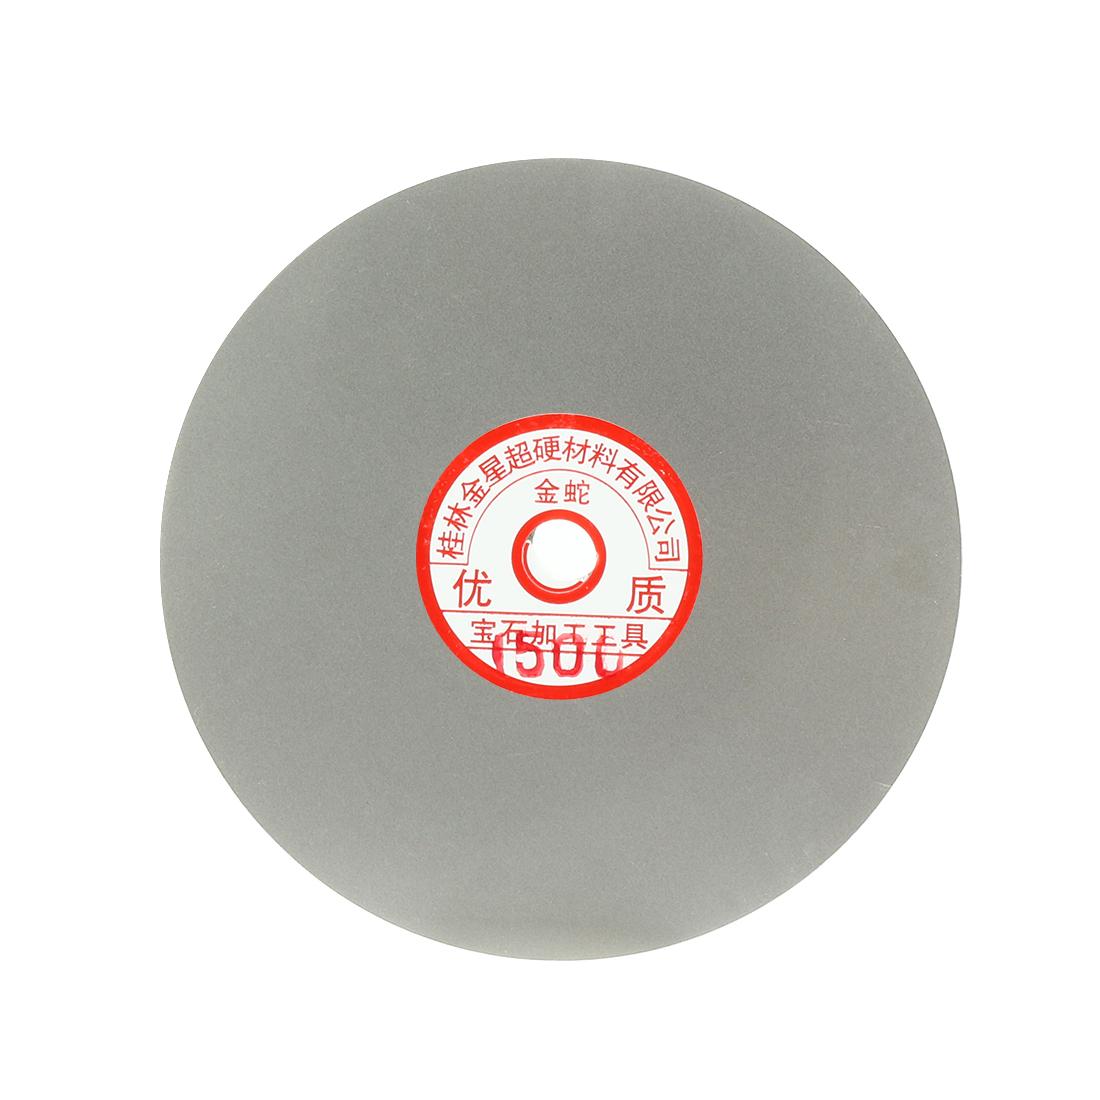 6-inch Grit 1500 Diamond Coated Flat Lap Wheel Grinding Sanding Polishing Disc